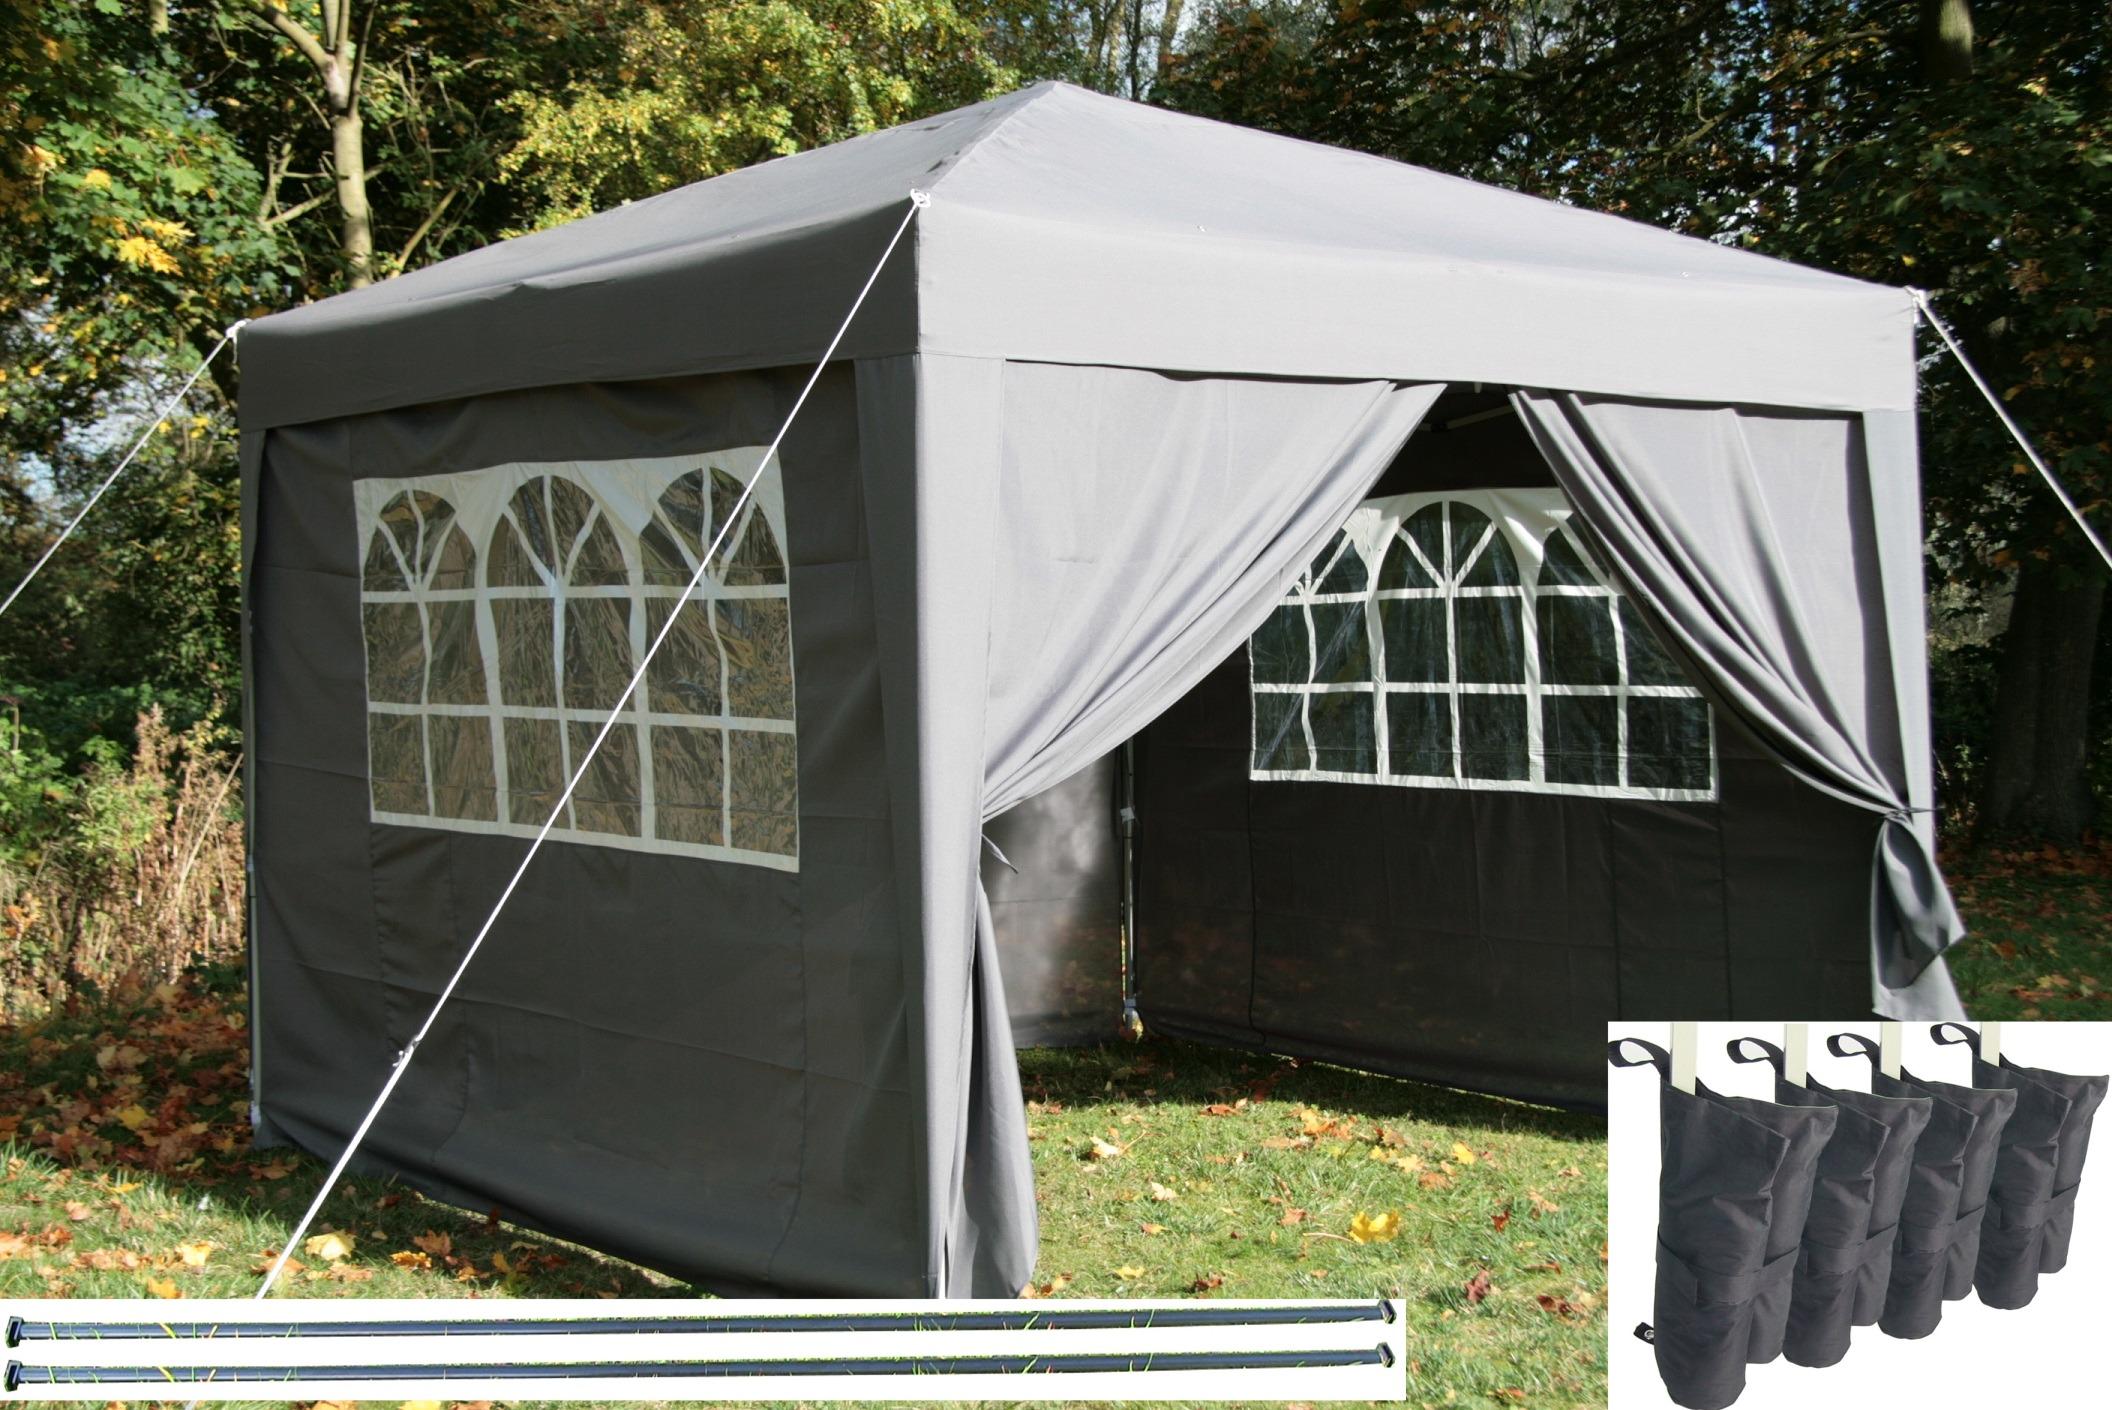 airwave 3x3m pop up gazebo waterproof garden gazebo 2. Black Bedroom Furniture Sets. Home Design Ideas